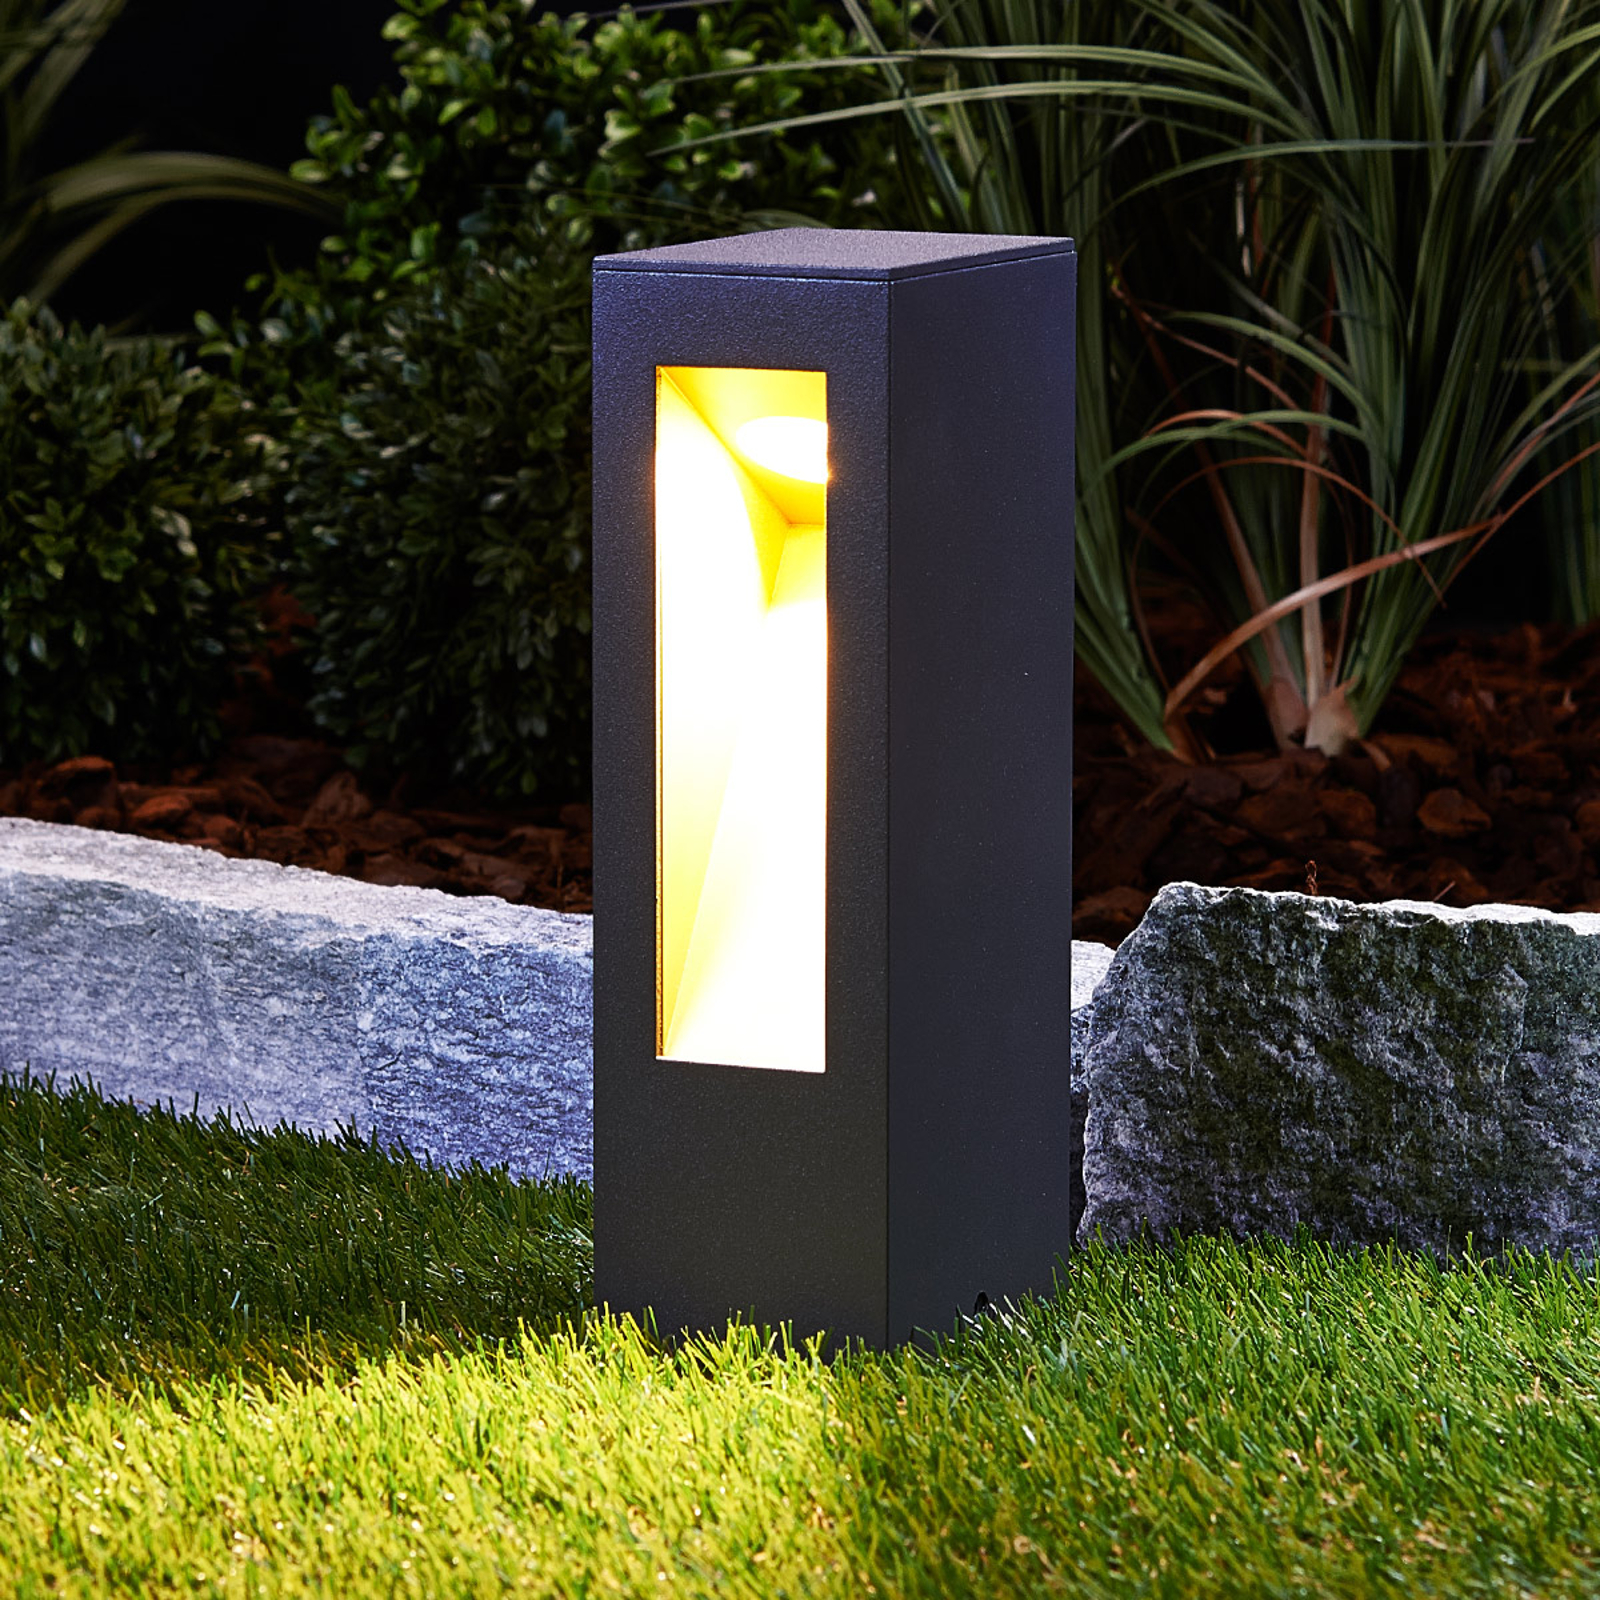 Słupek oświetleniowy LED Jenke z aluminium